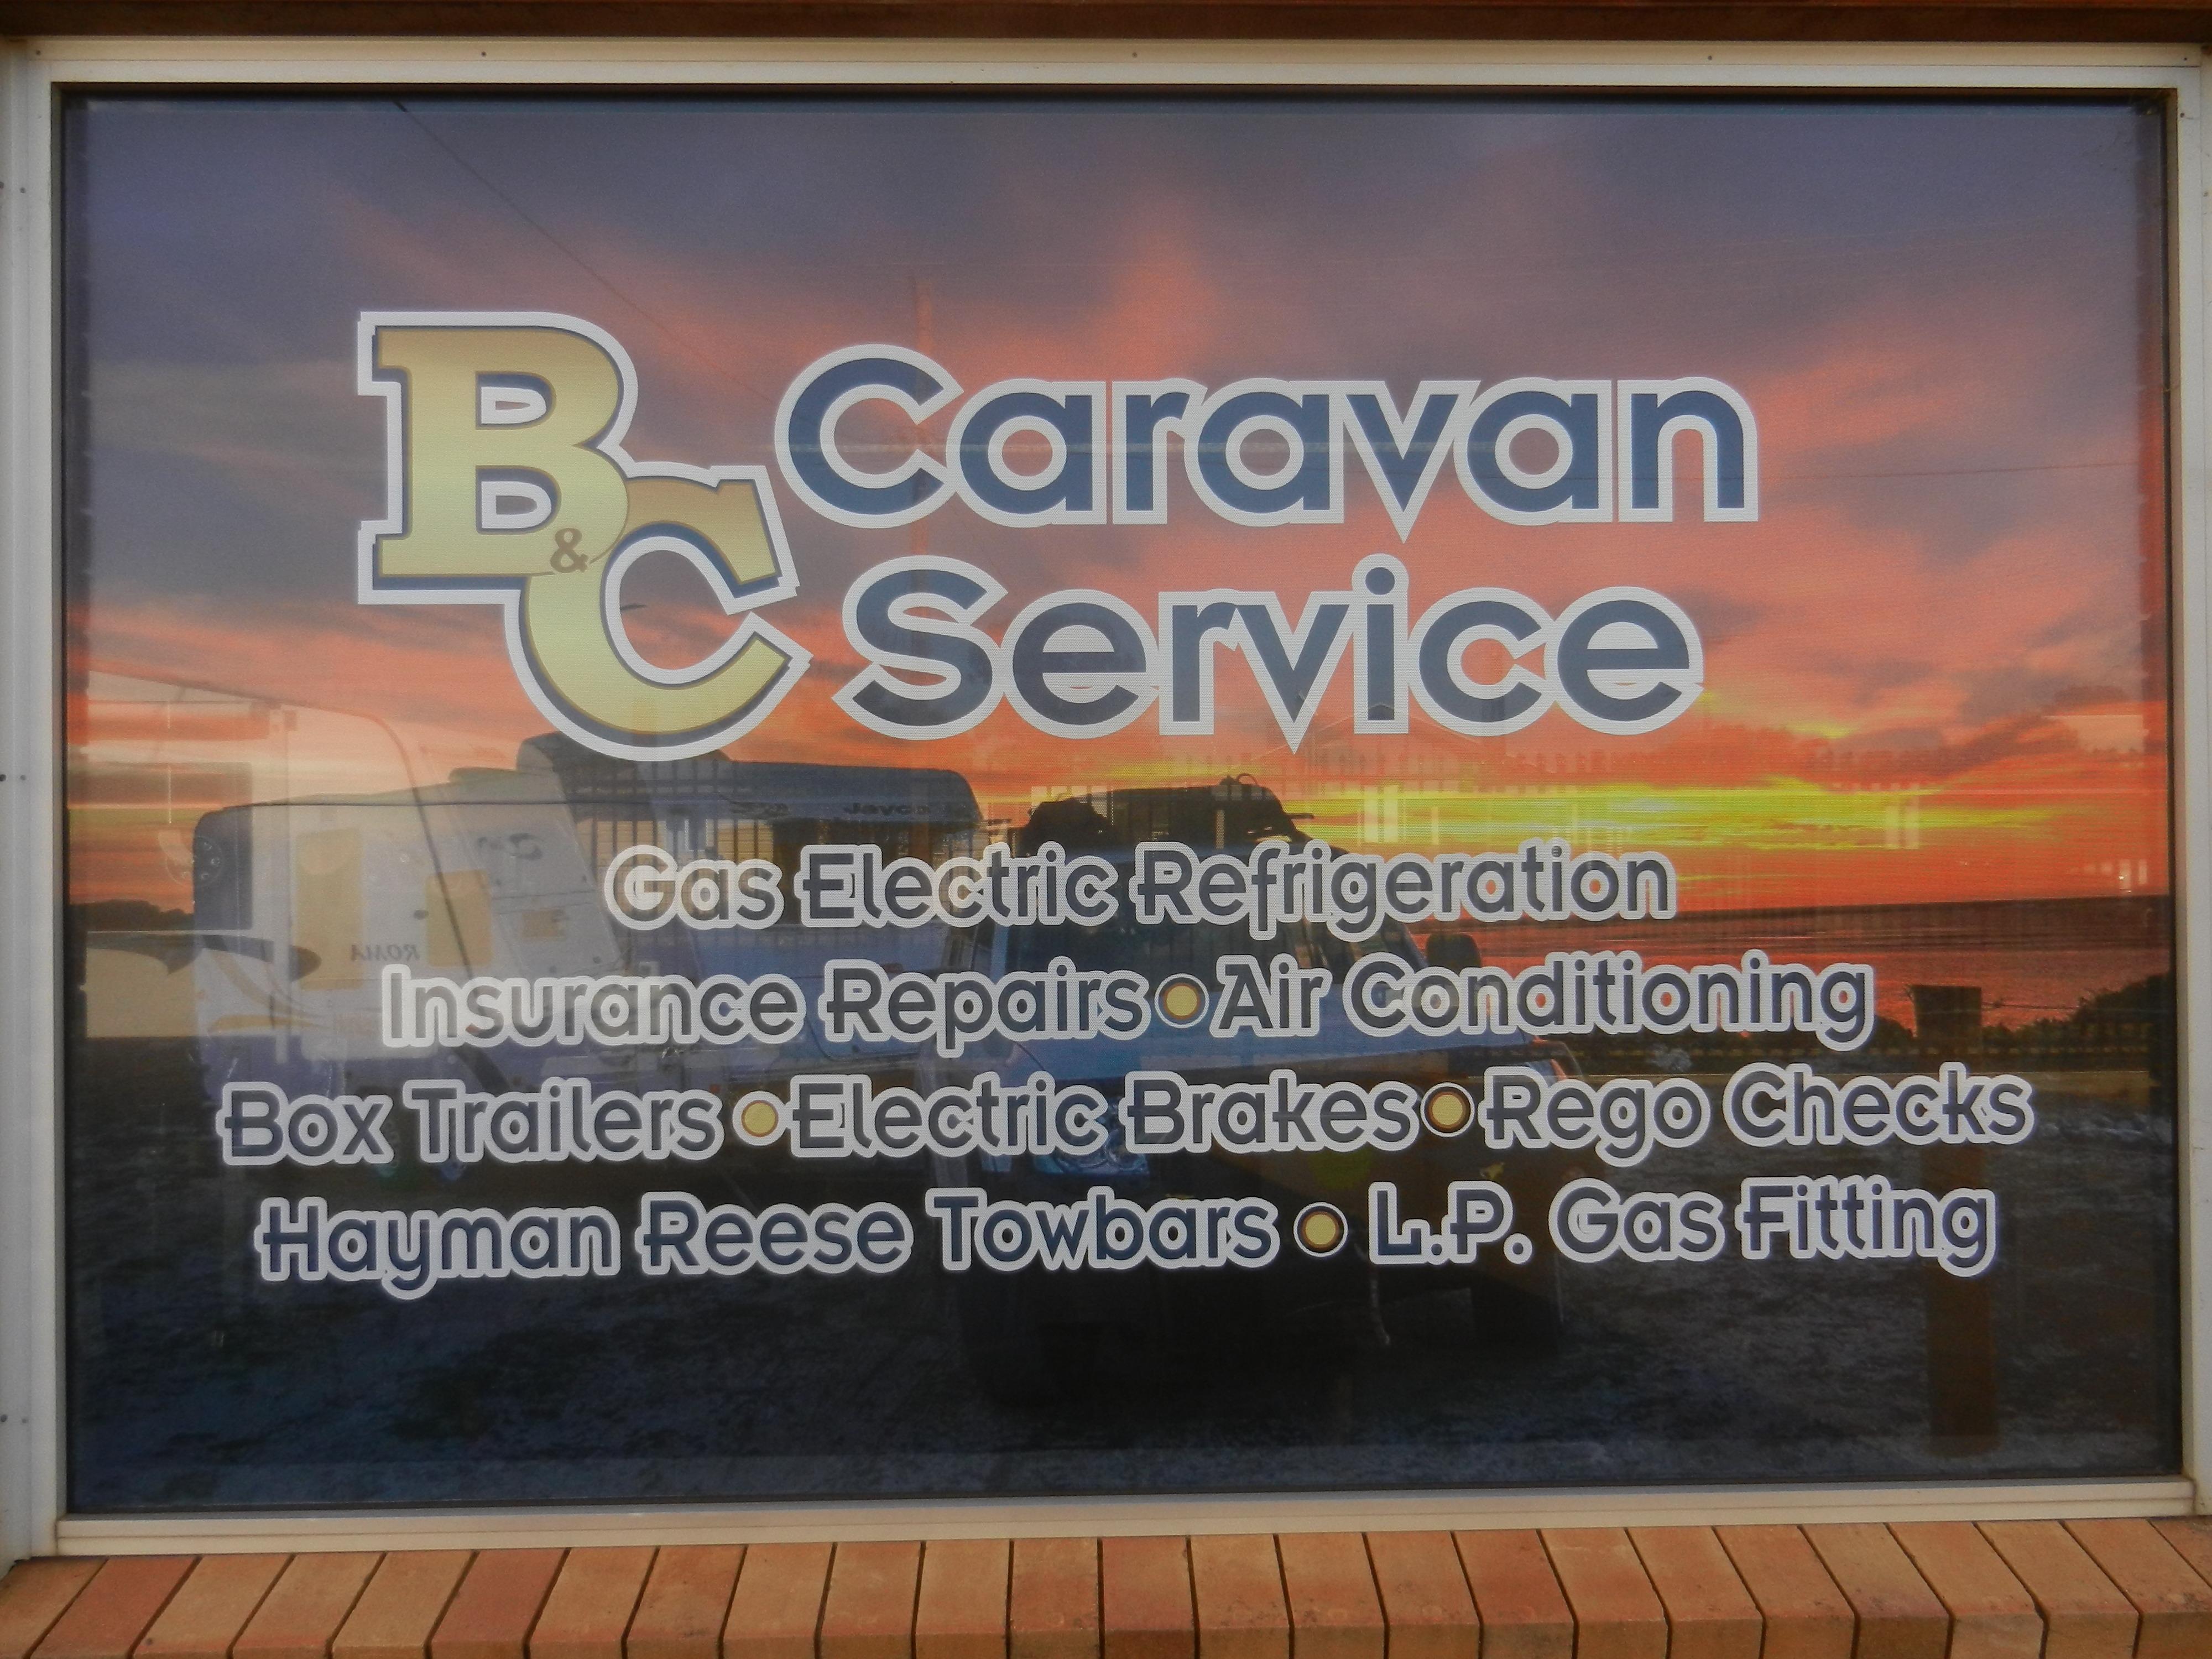 B&C Caravan Service Dubbo